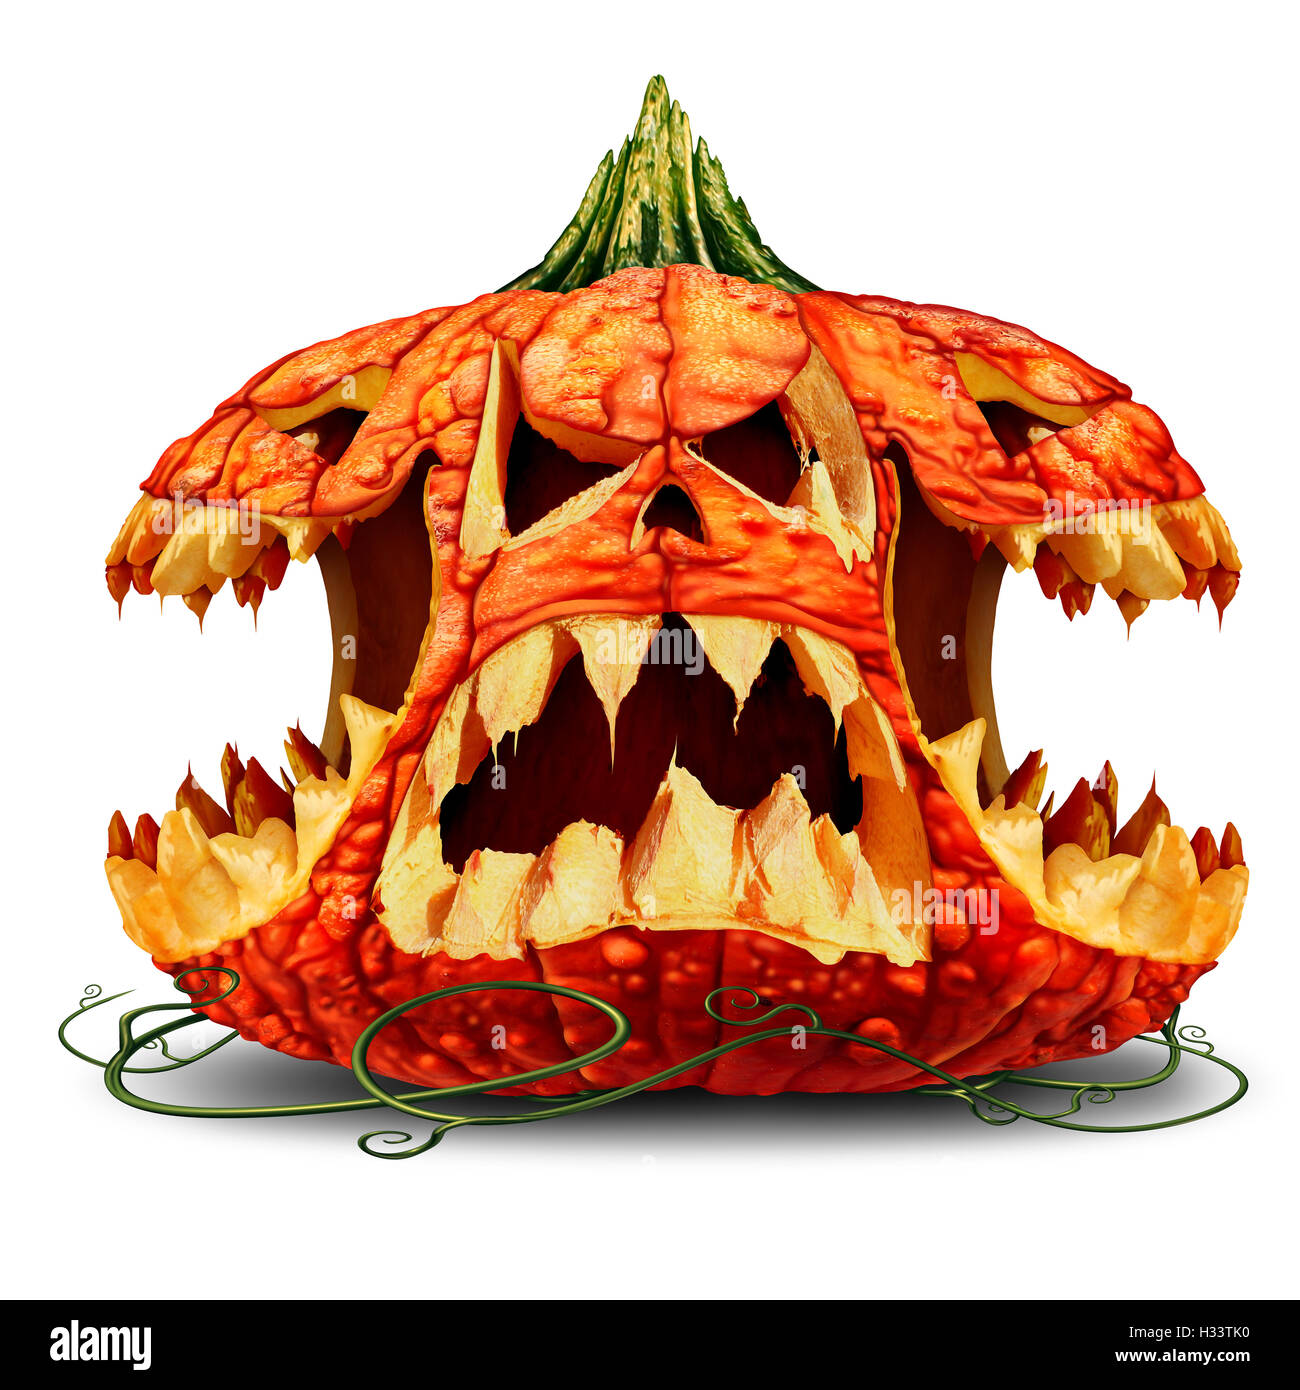 Scary Halloween Pumpkin Character Group And Creepy Jack O